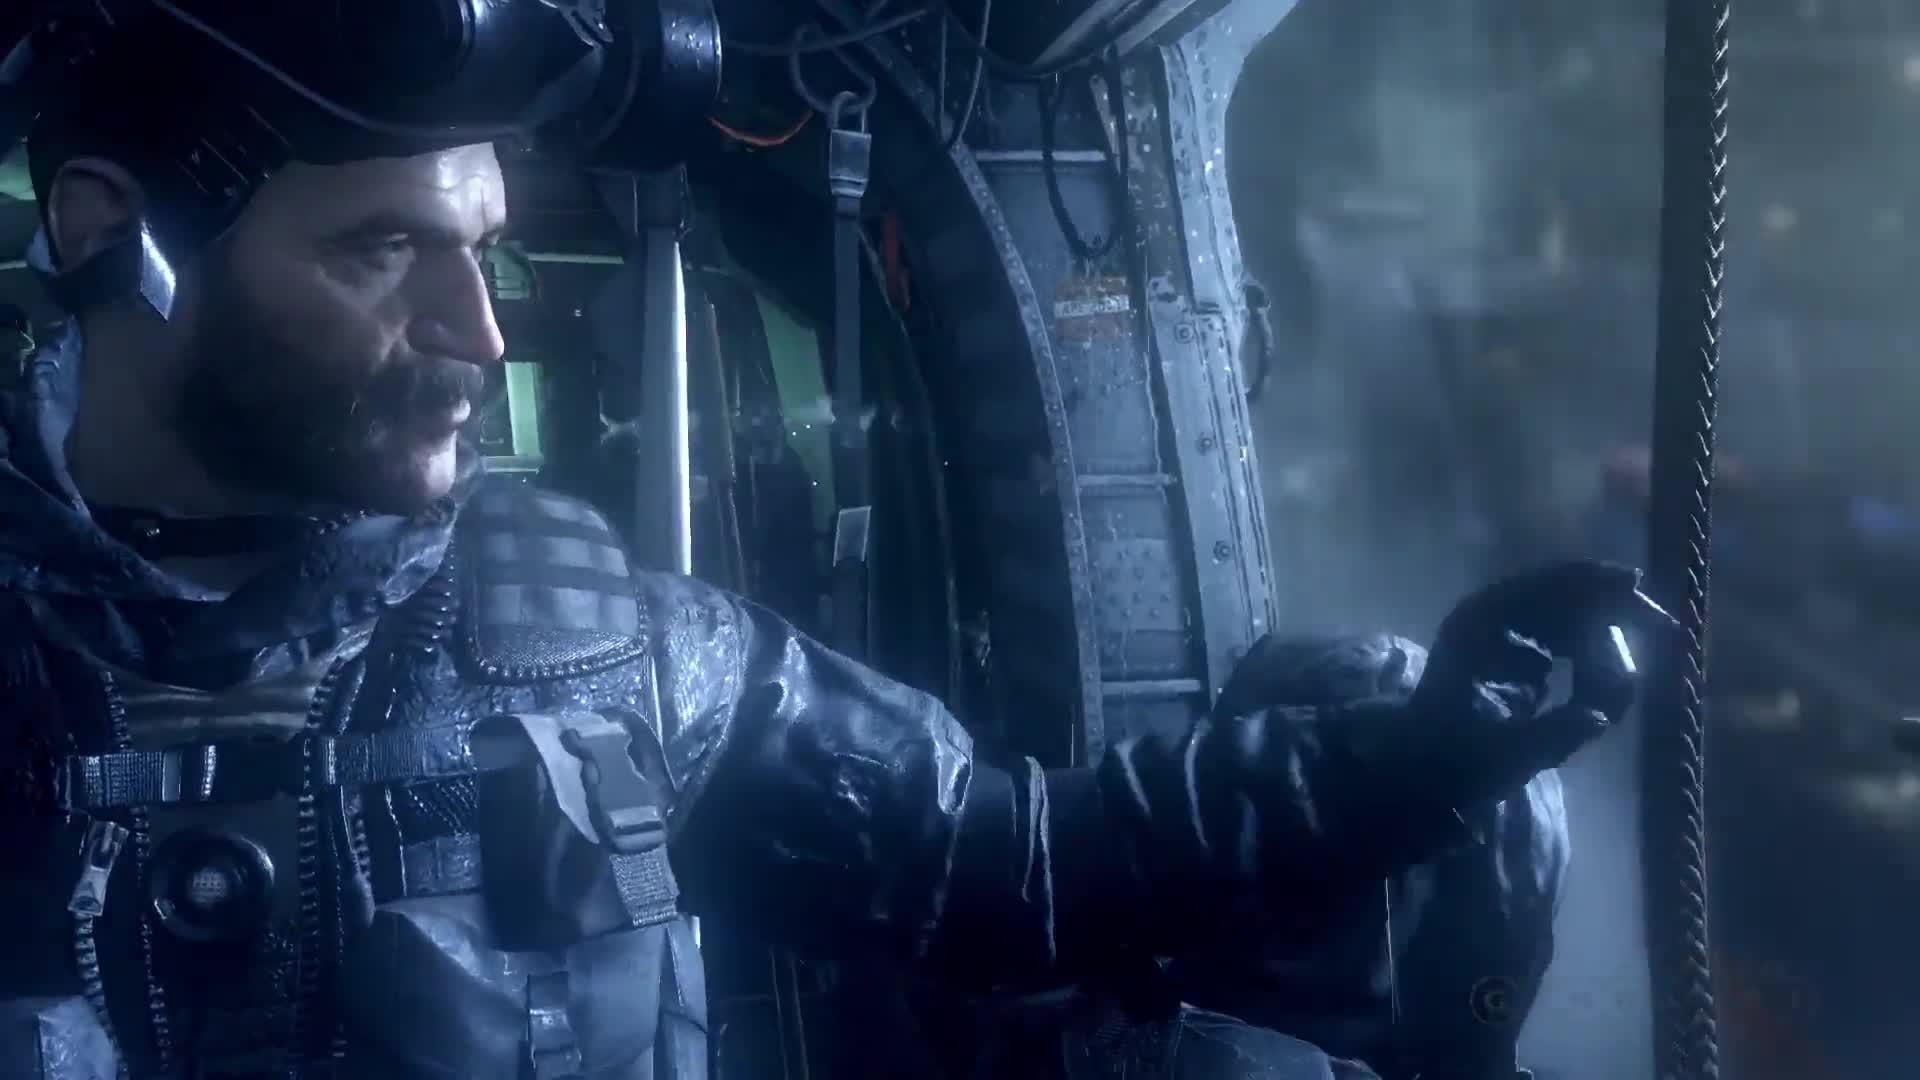 Call of Duty Modern Warfare Remastered - Launch trailer